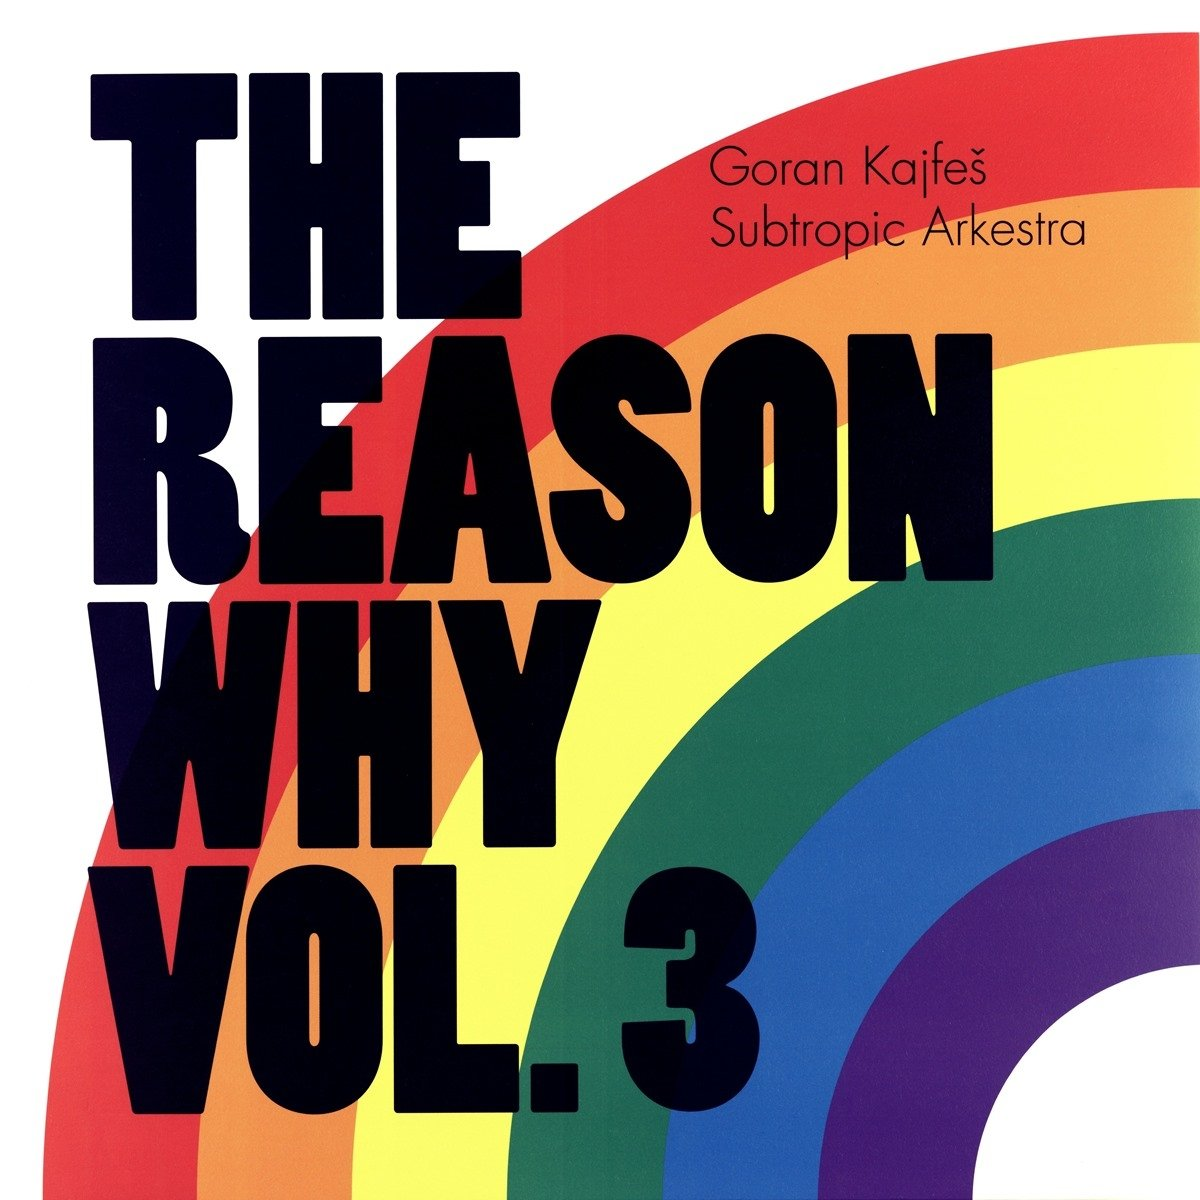 Goran Kajfeš Subtropic Arkestra - The Reasons Why Vol. 3 [LP]